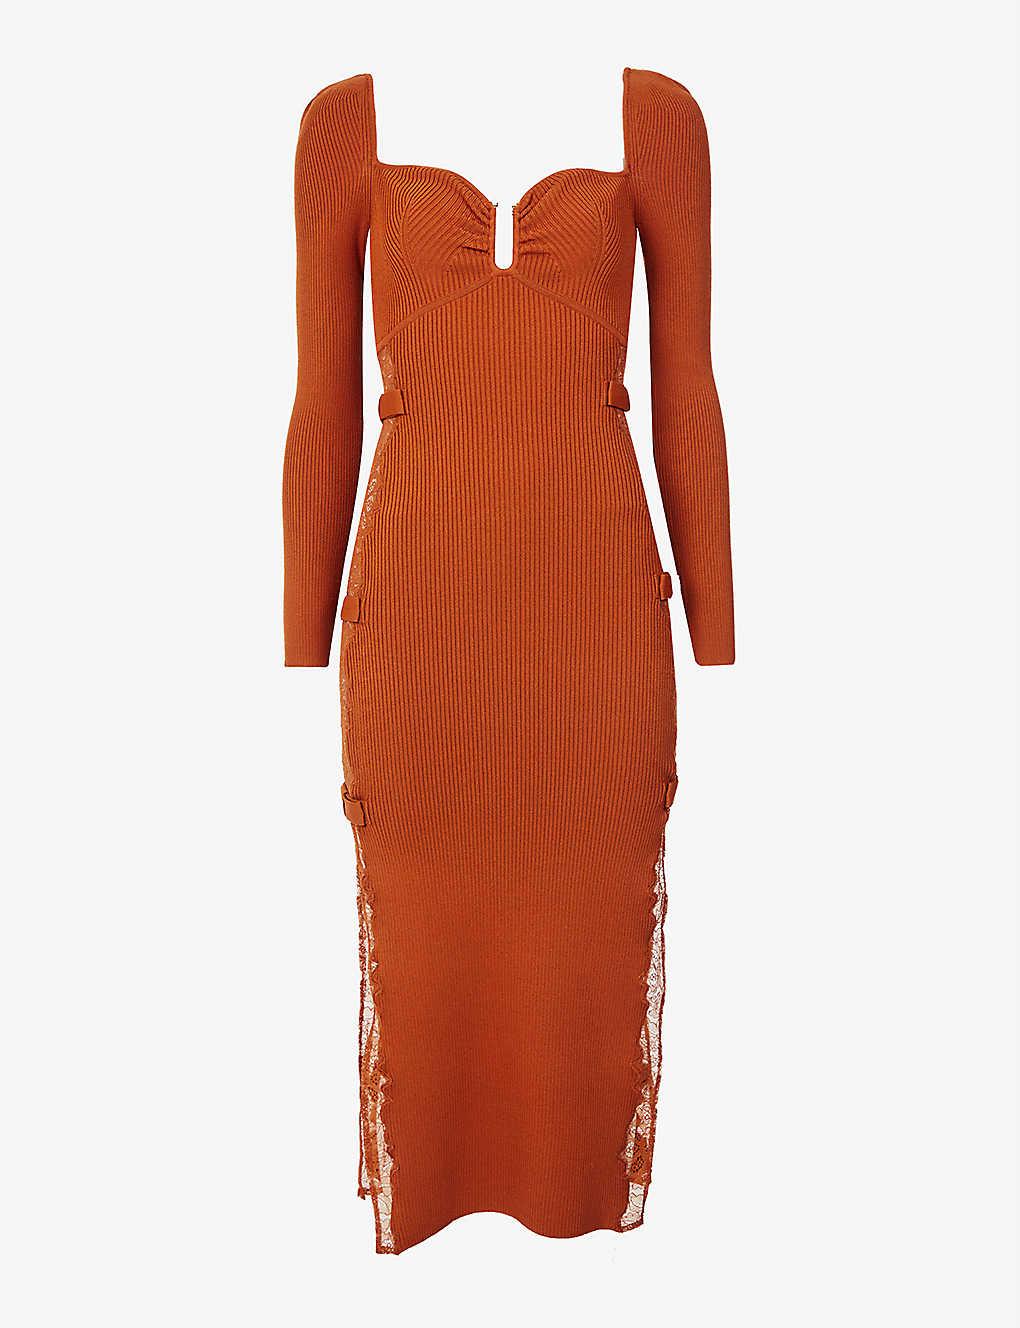 Sweetheart-neckline stretch-knit midi dress by Self Portrait, available on selfridges.com for EUR350 Selena Gomez Dress Exact Product